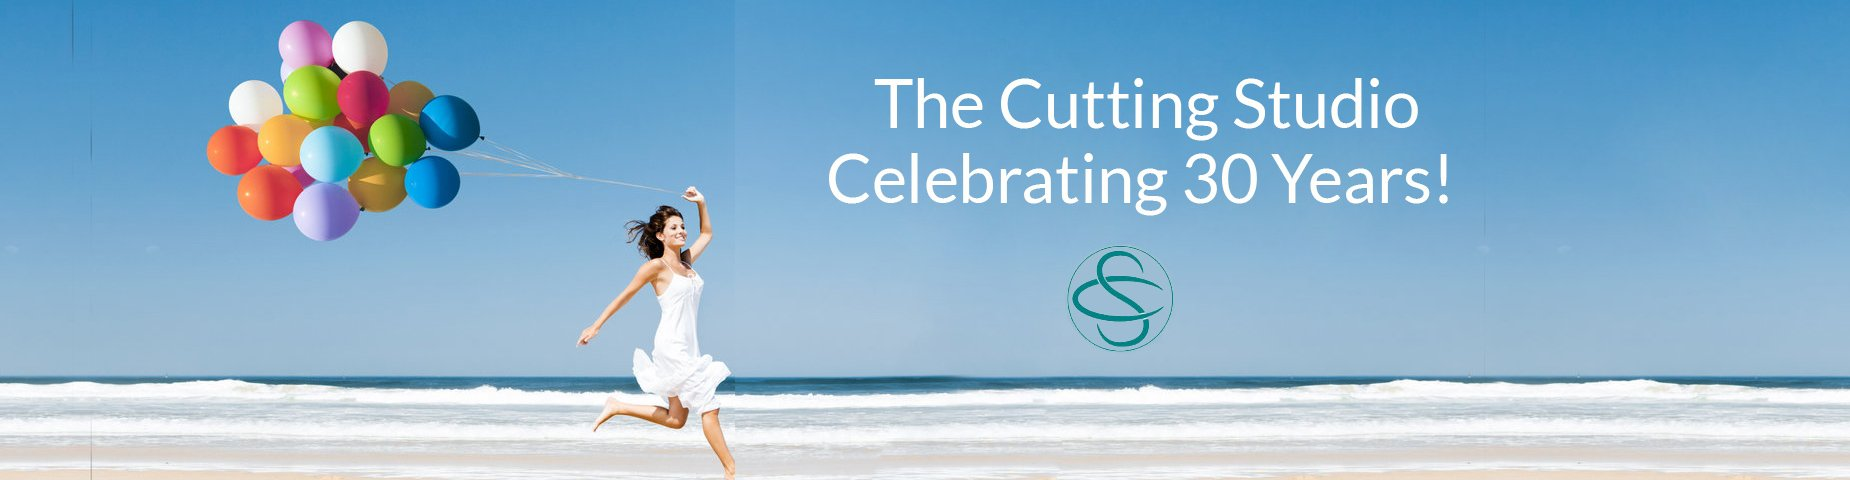 The cutting Studio Celebrating 30 Years 1